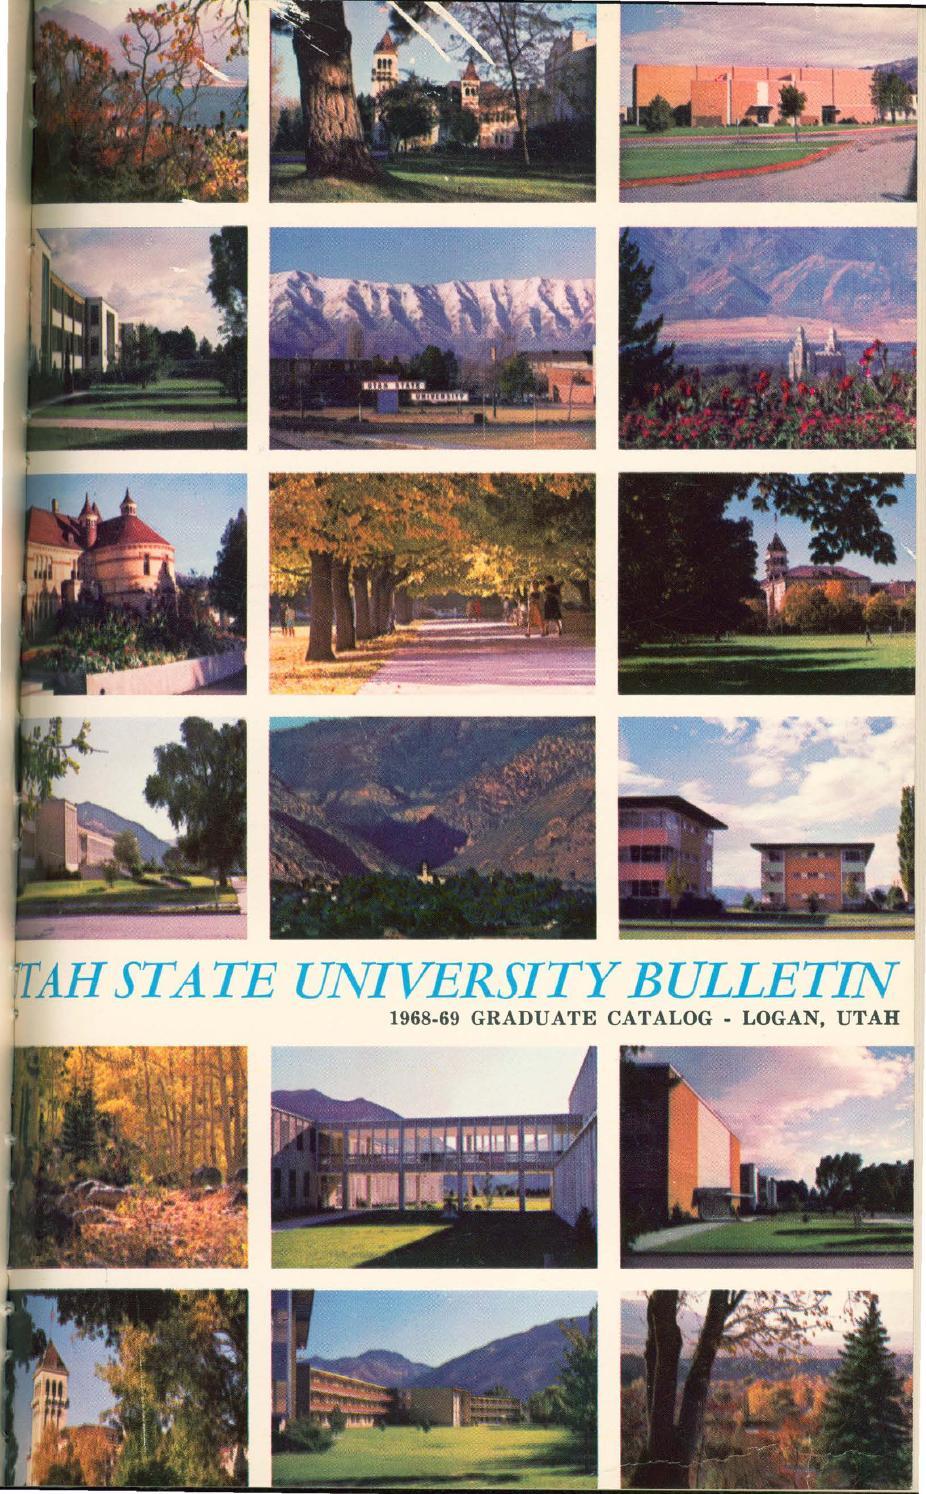 USU General Catalog 1968 Graduate by USU Digital Commons - issuu